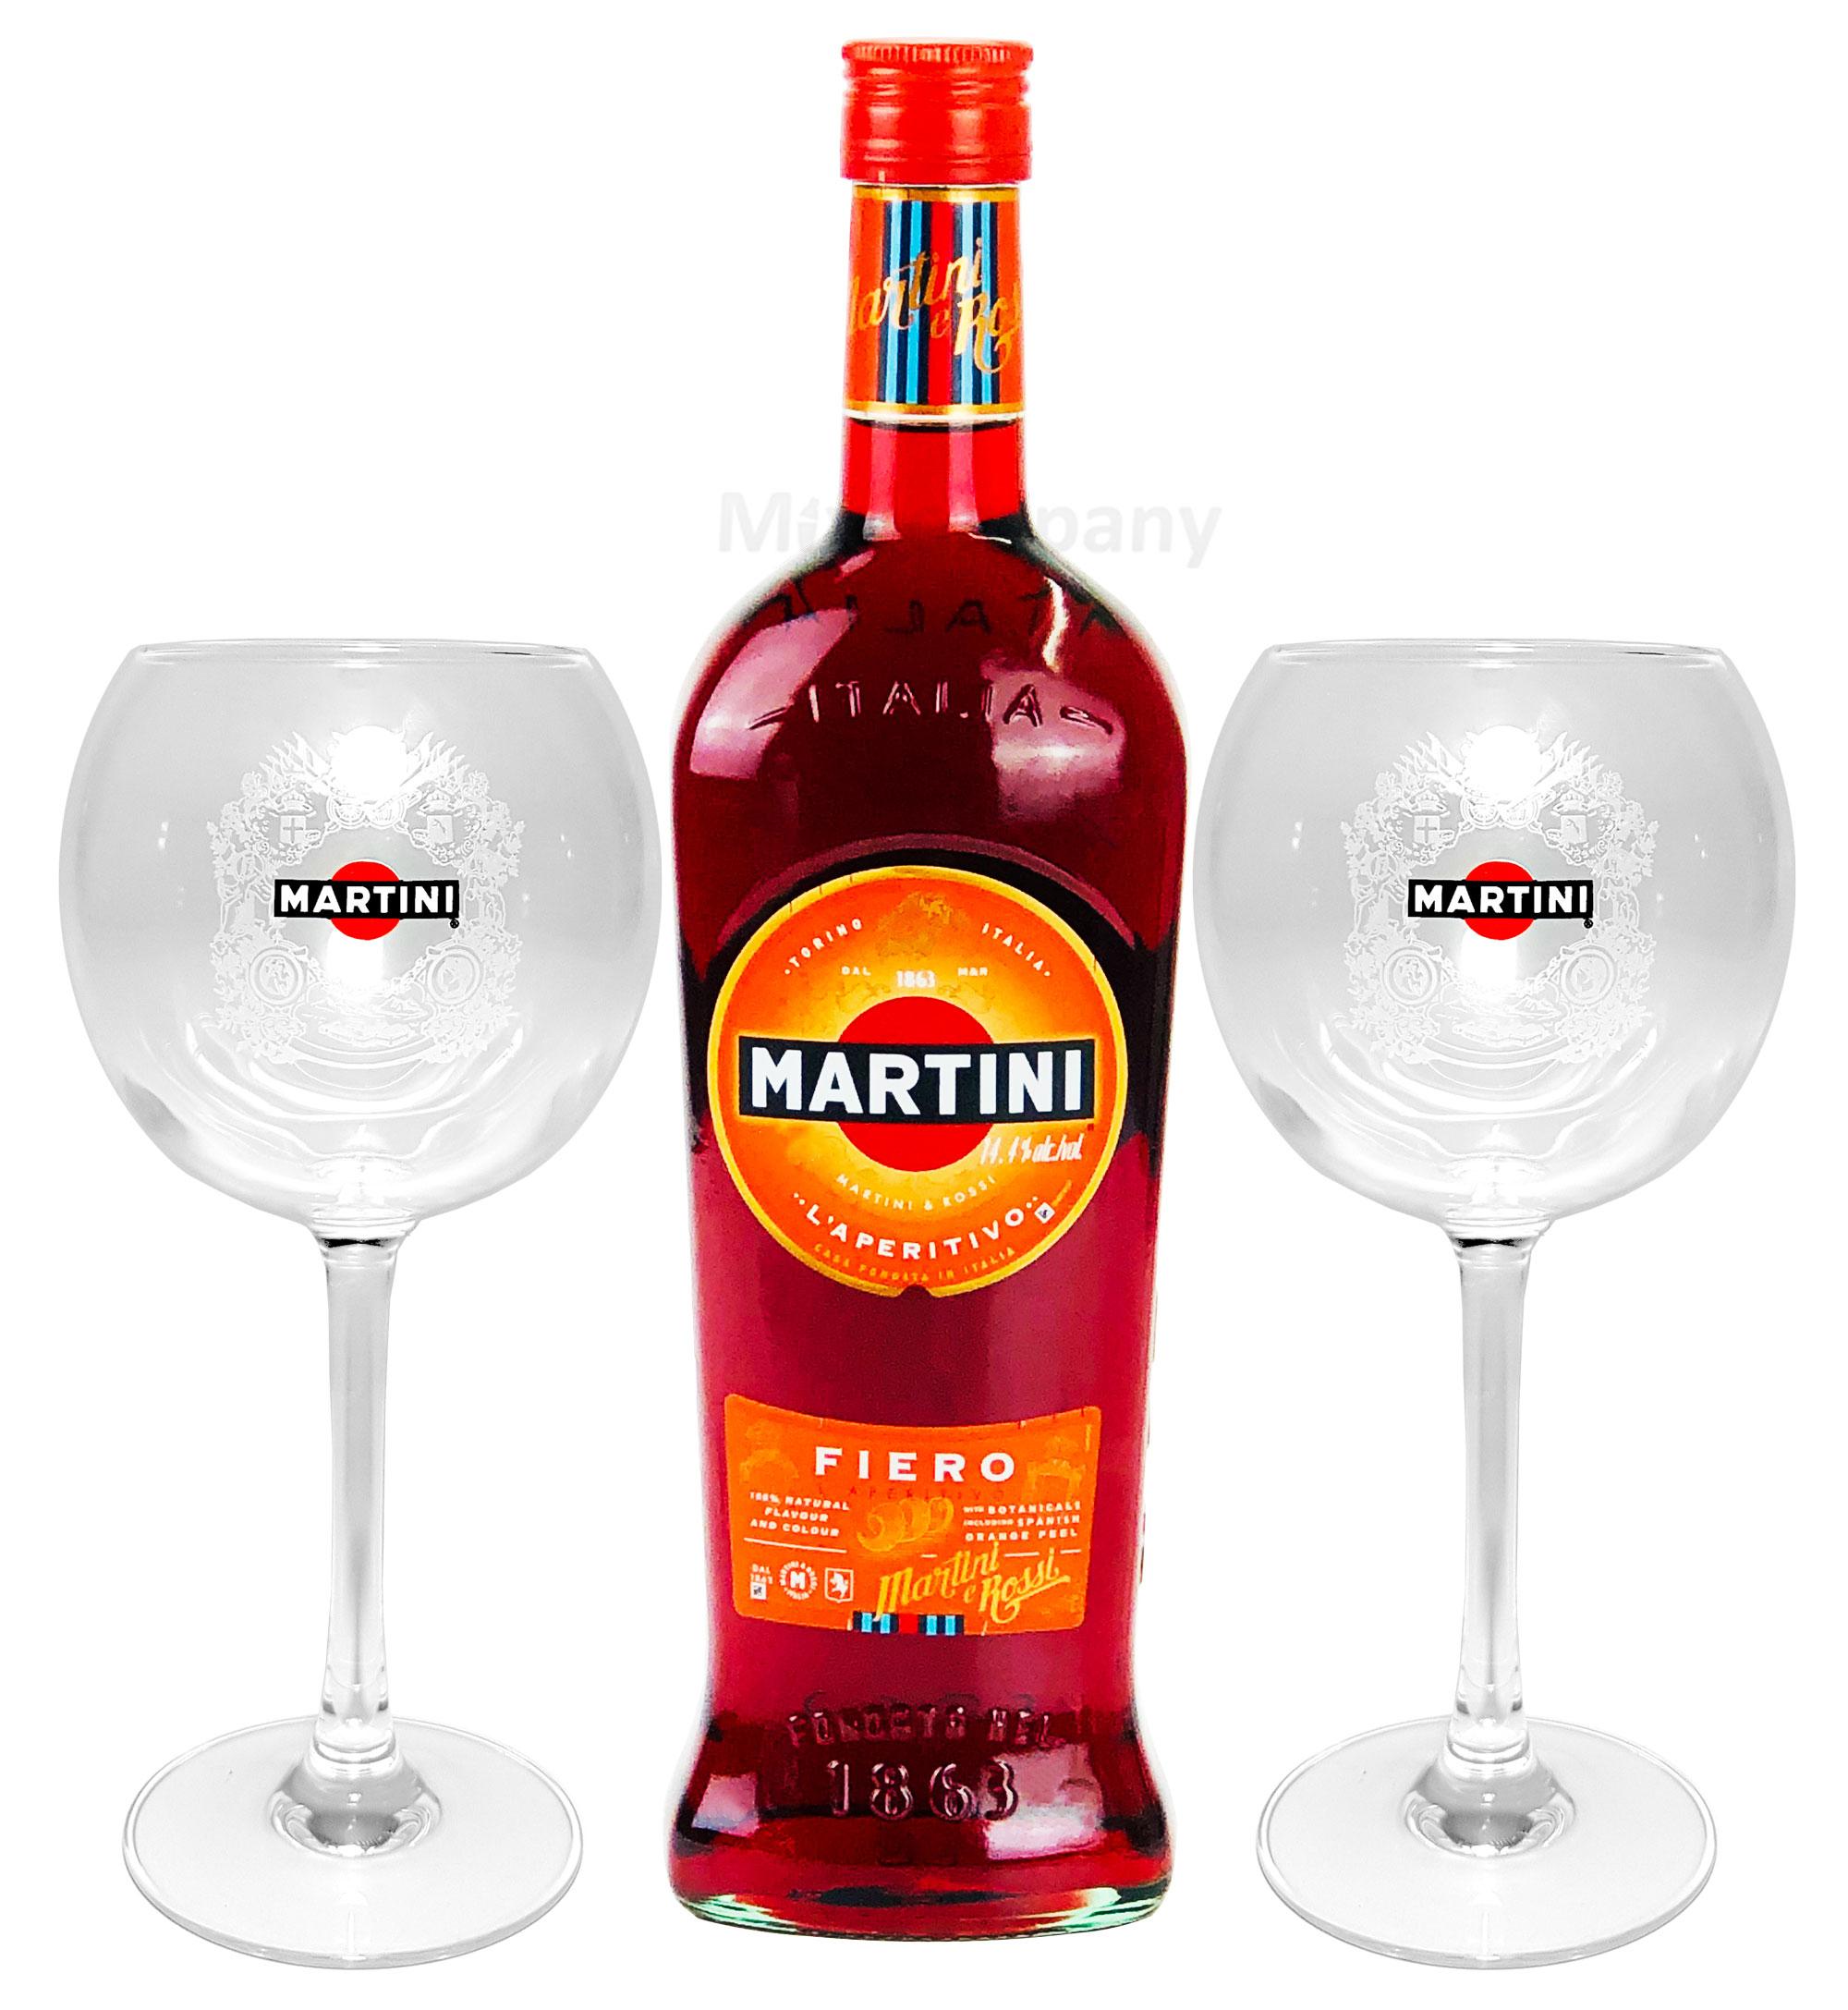 Martini Fiero Wermut 1L (14,4% Vol) + Martini Royale Ballon Cocktail Glas Set - 2x Gläser 47cl - [Enthält Sulfite]